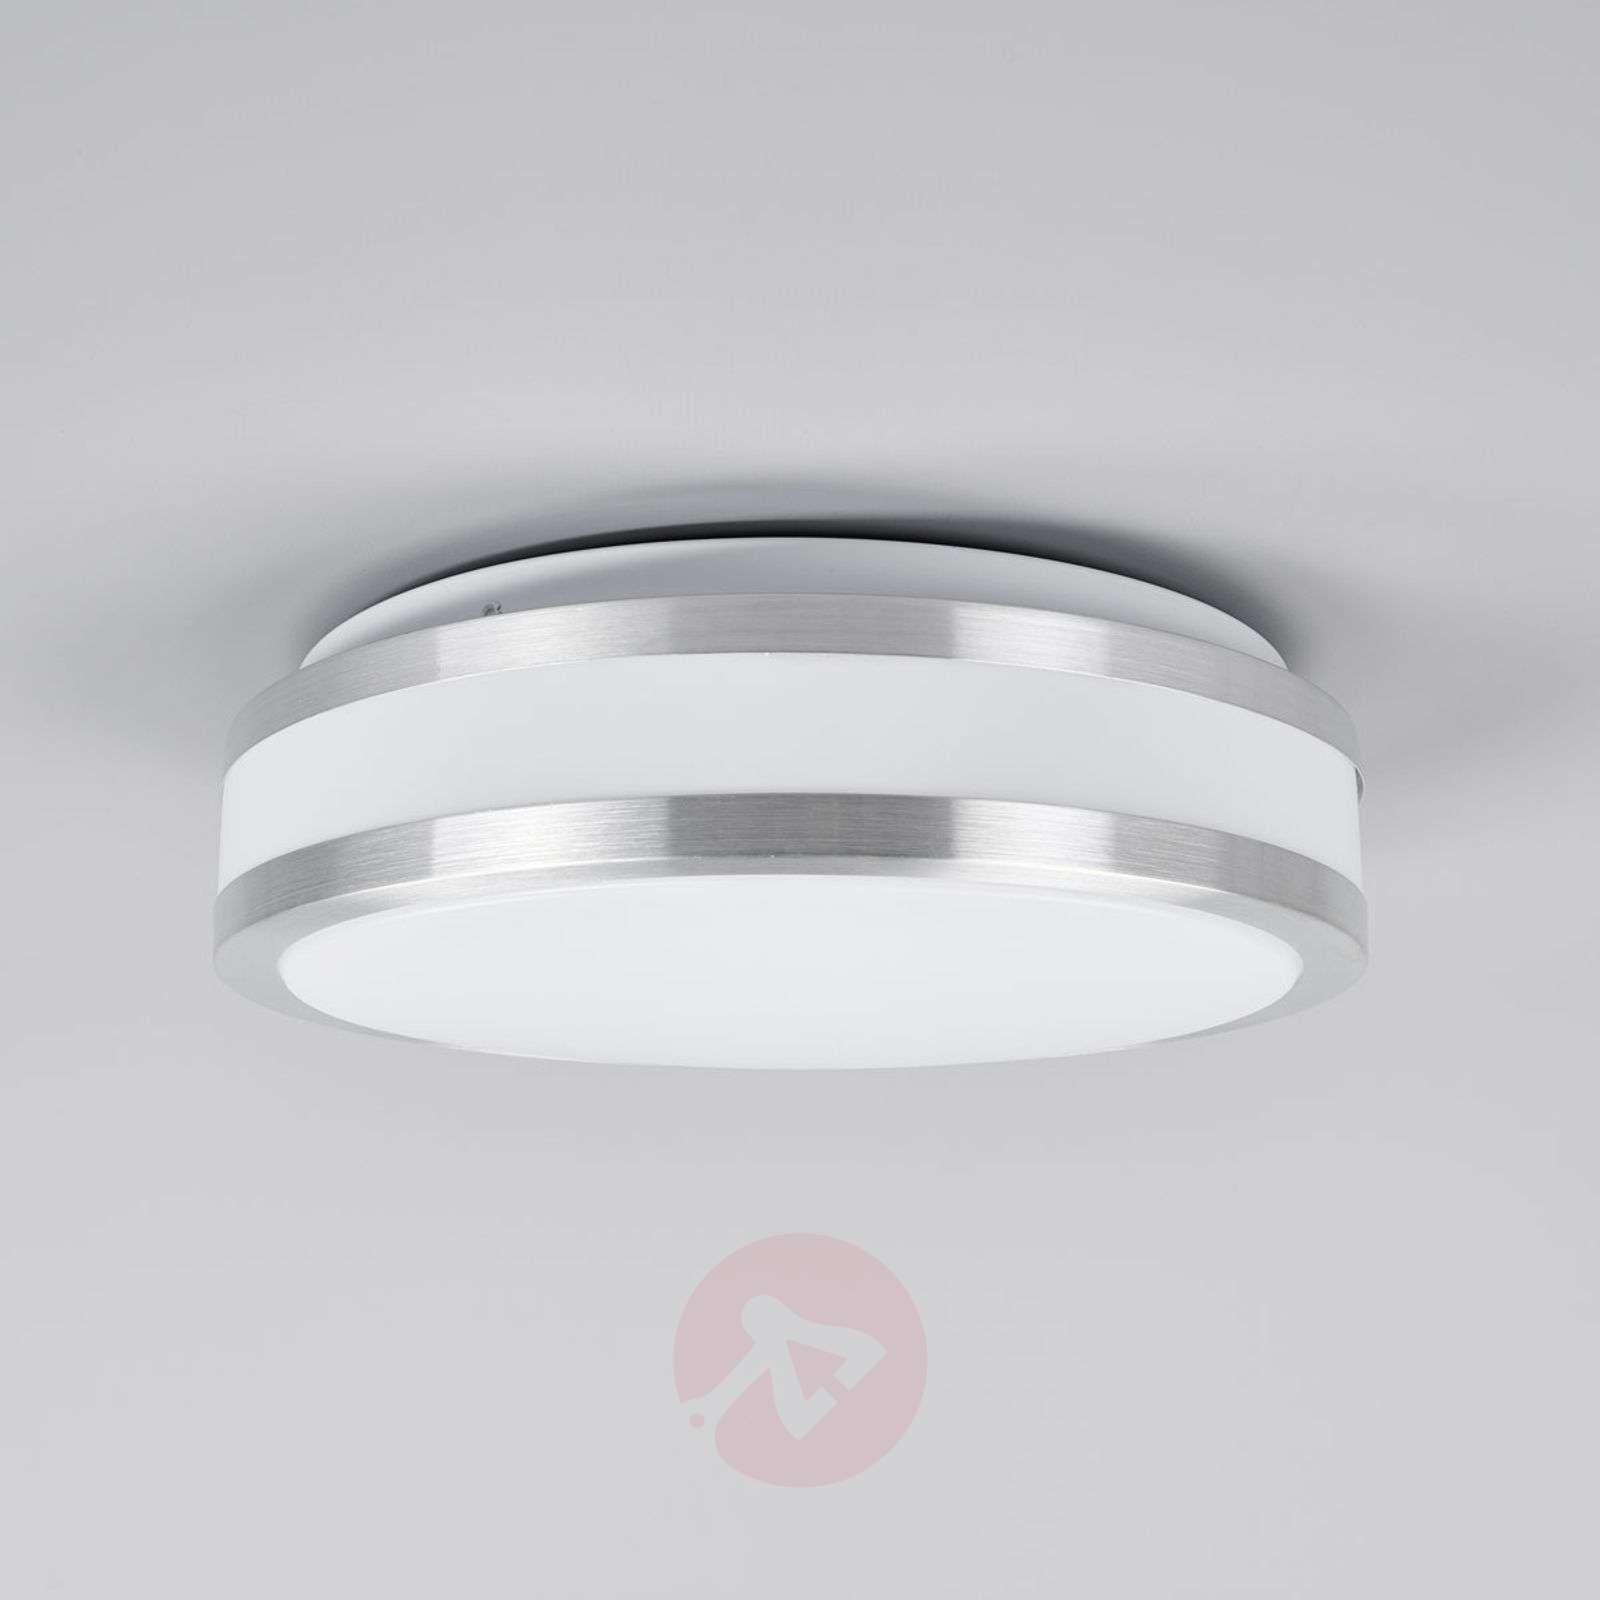 Simple LED ceiling light Edona, aluminium frame-9974023-01